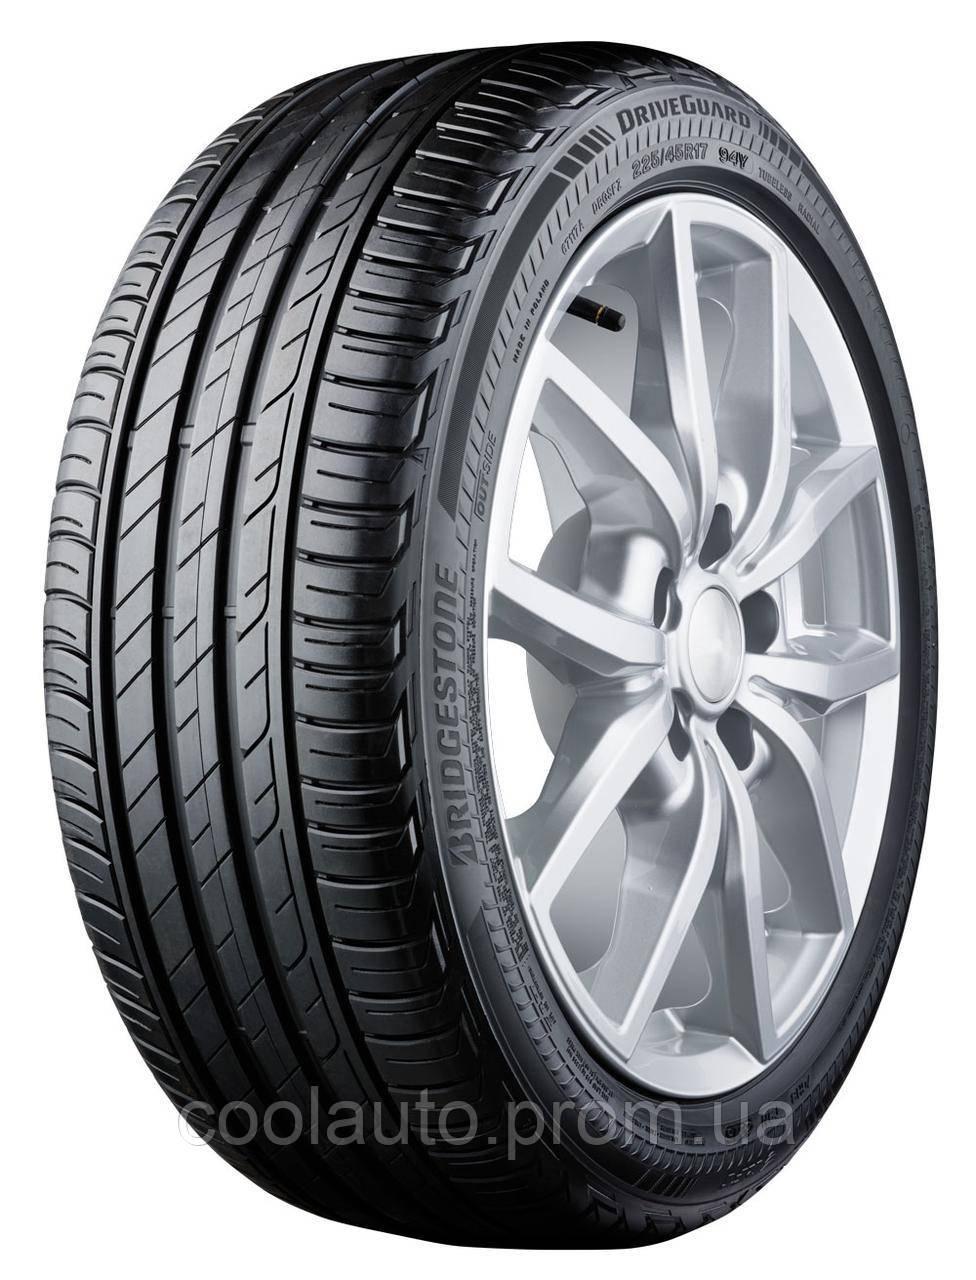 Шины Bridgestone DriveGuard 205/55 R16 94W XL Run Flat